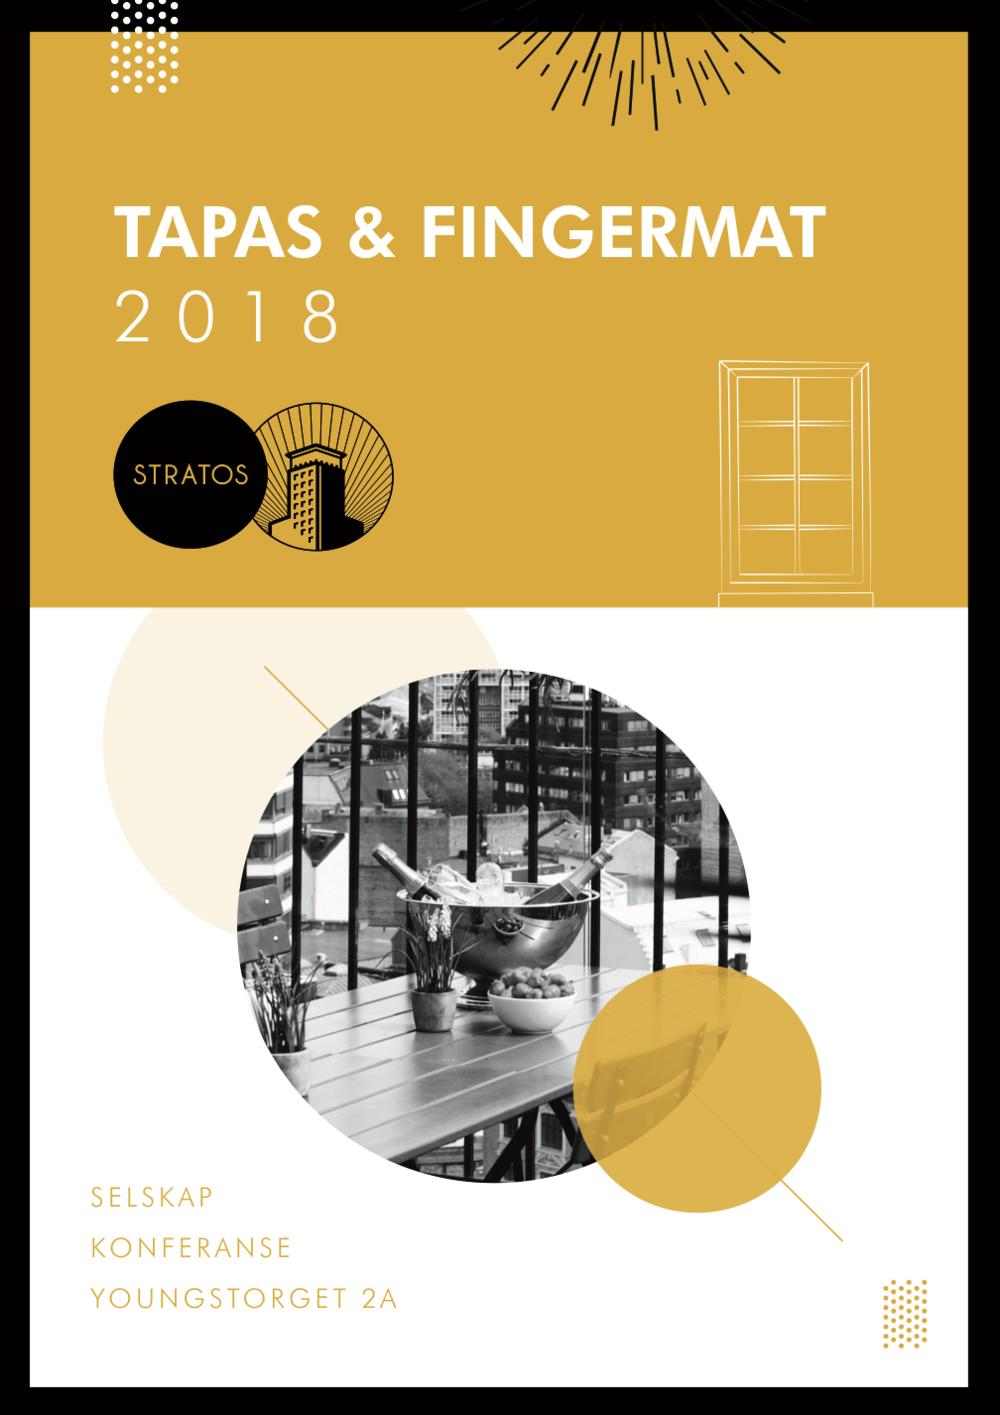 Stratos tapas og fingermatmenyer 2018.png